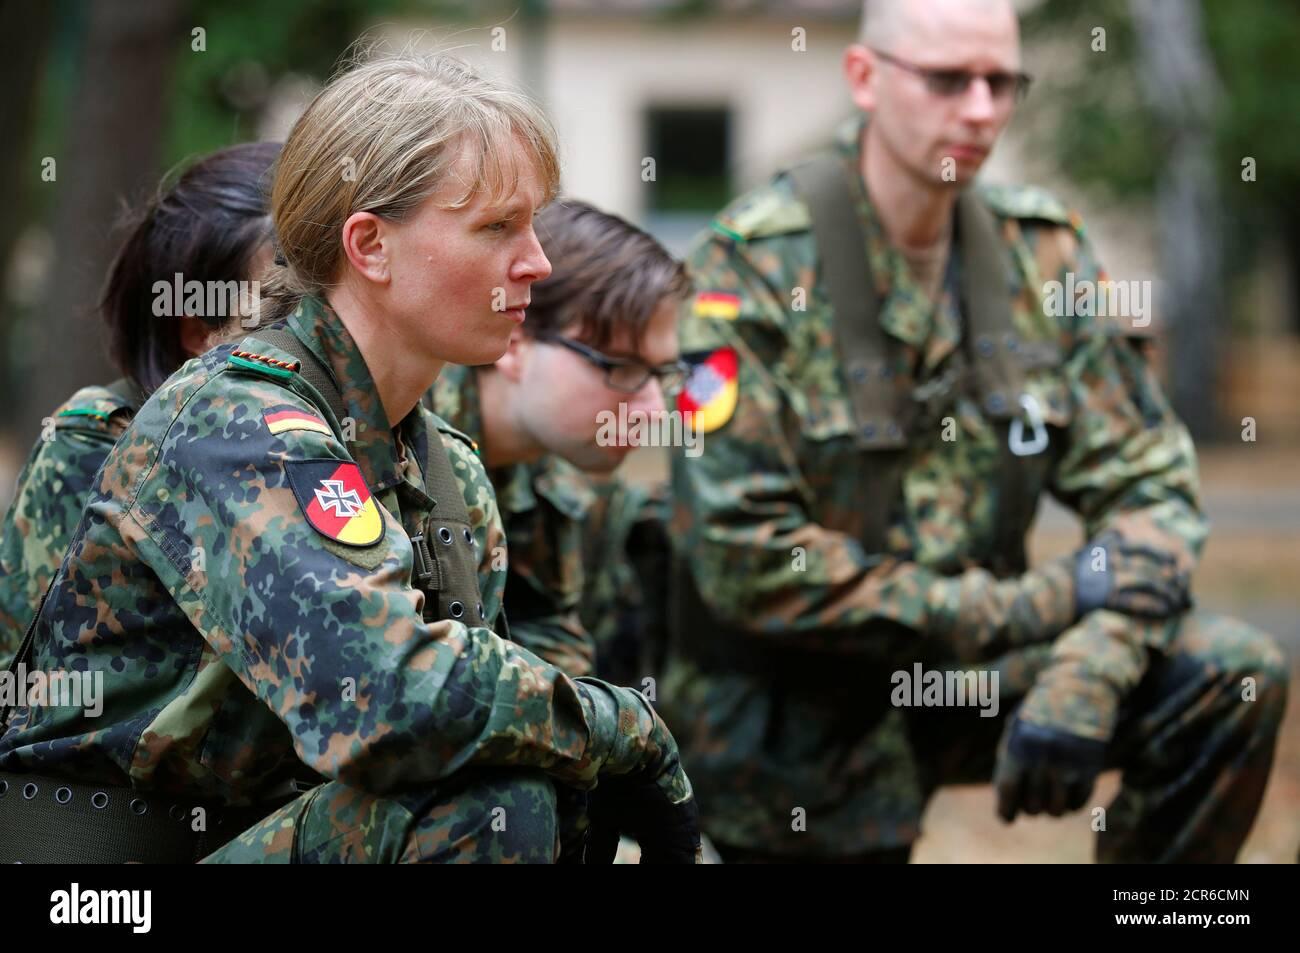 Members of the German Armed Forces (Bundeswehr) Reservists Association train civilians willing to become the reservists of Bundeswehr in Berlin, Germany, September 15, 2018. REUTERS/Hannibal Hanschke Stock Photo